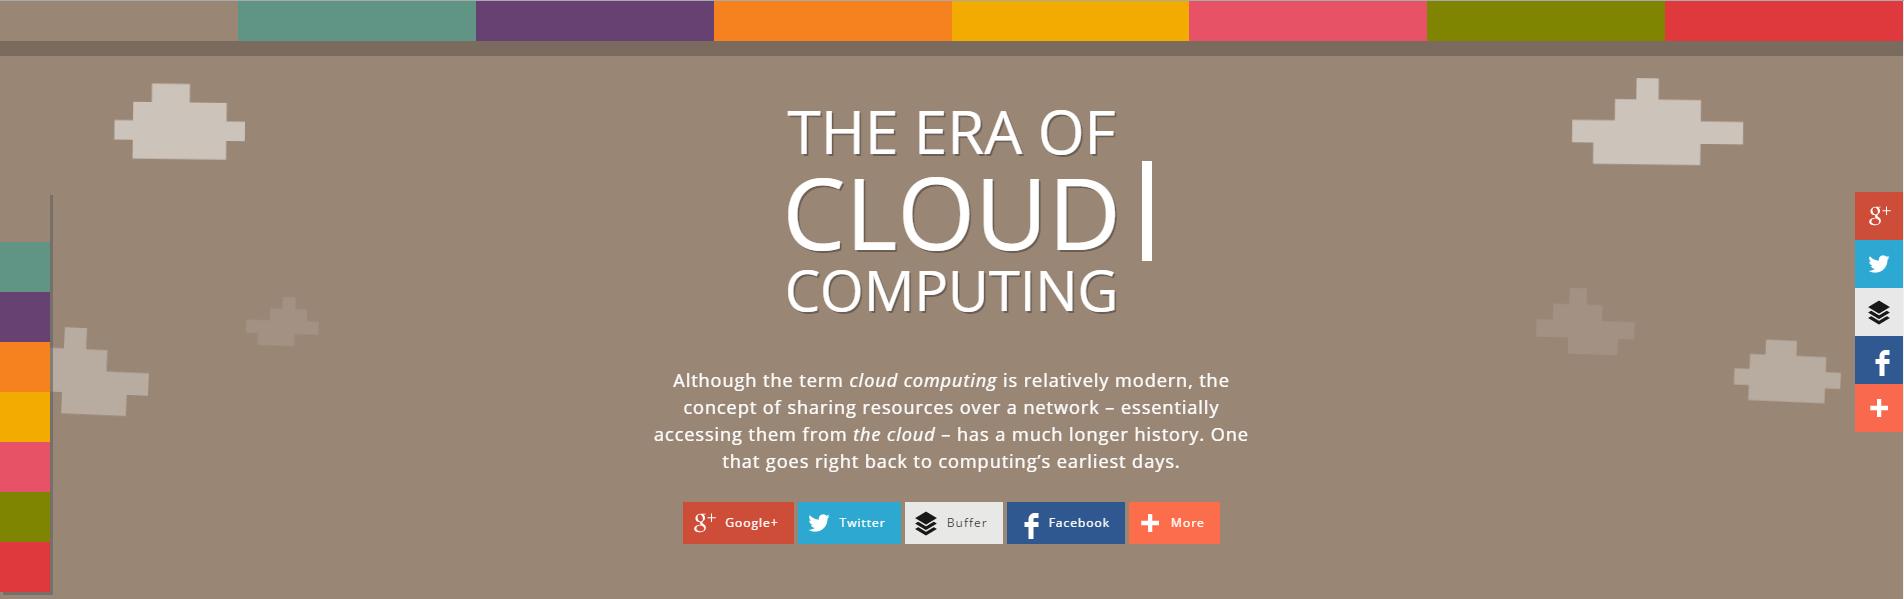 era of cloud computing timeline